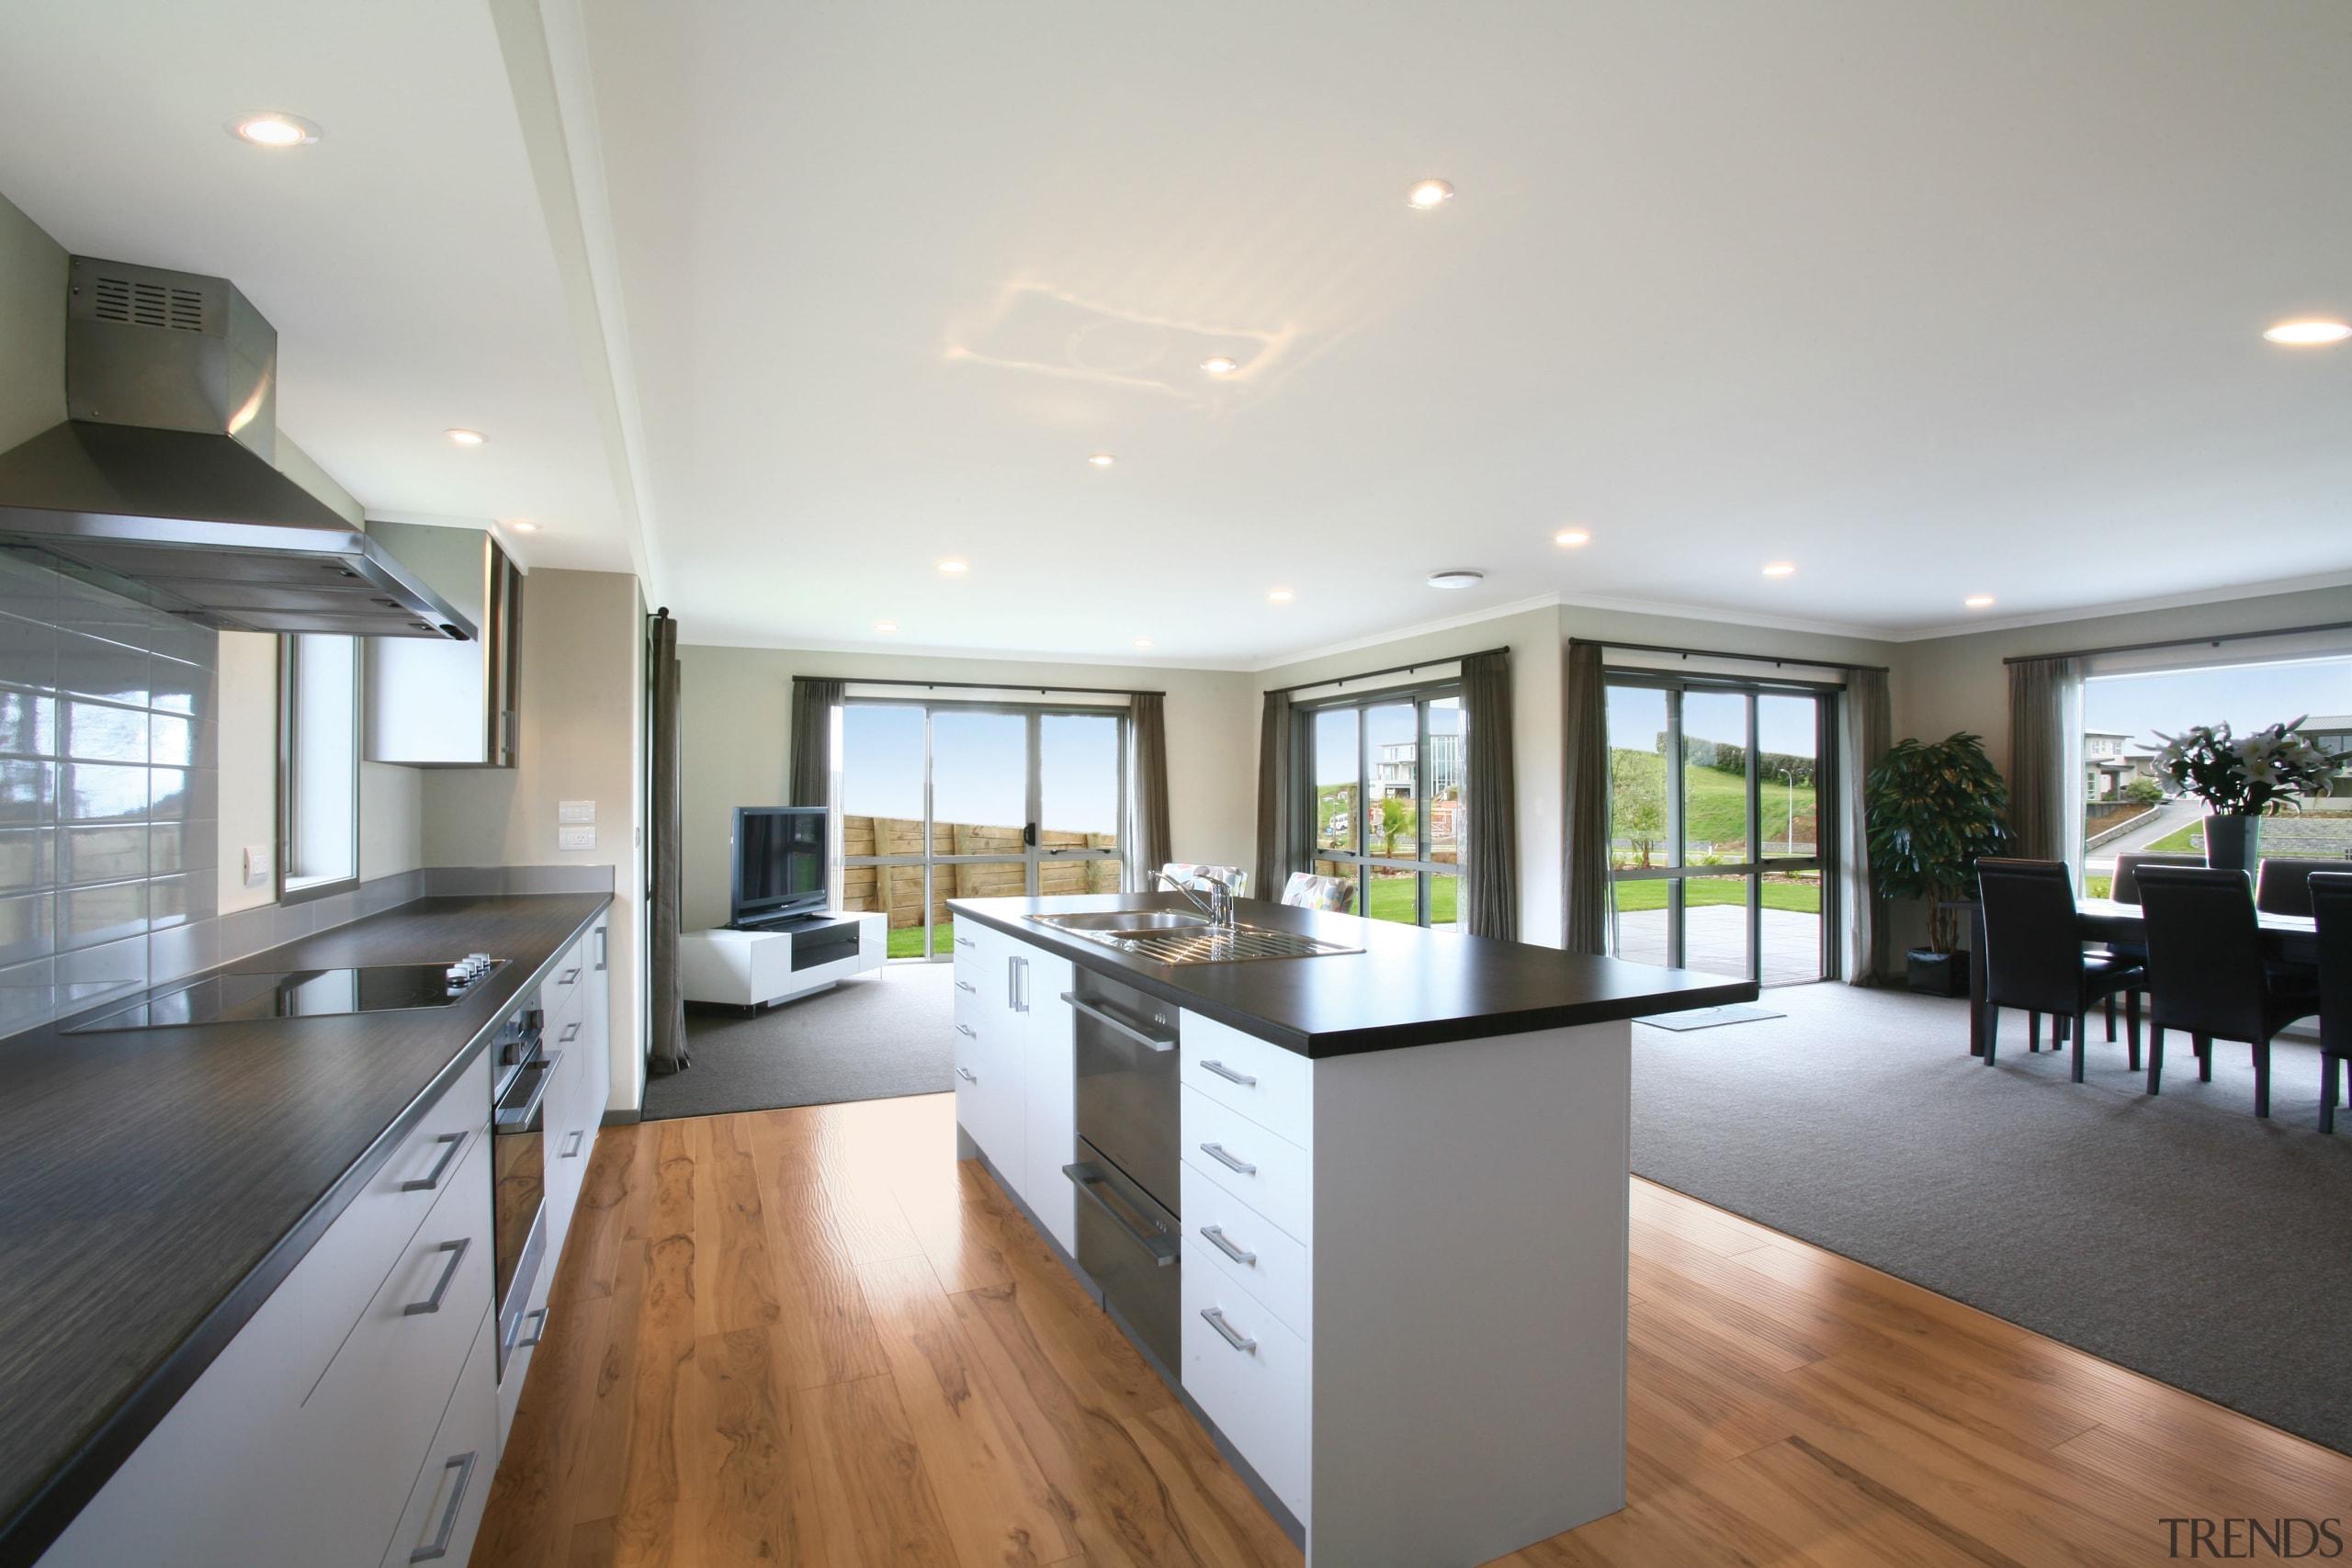 View of open-plan kitchen and dining area of countertop, floor, flooring, hardwood, interior design, kitchen, property, real estate, room, window, wood flooring, gray